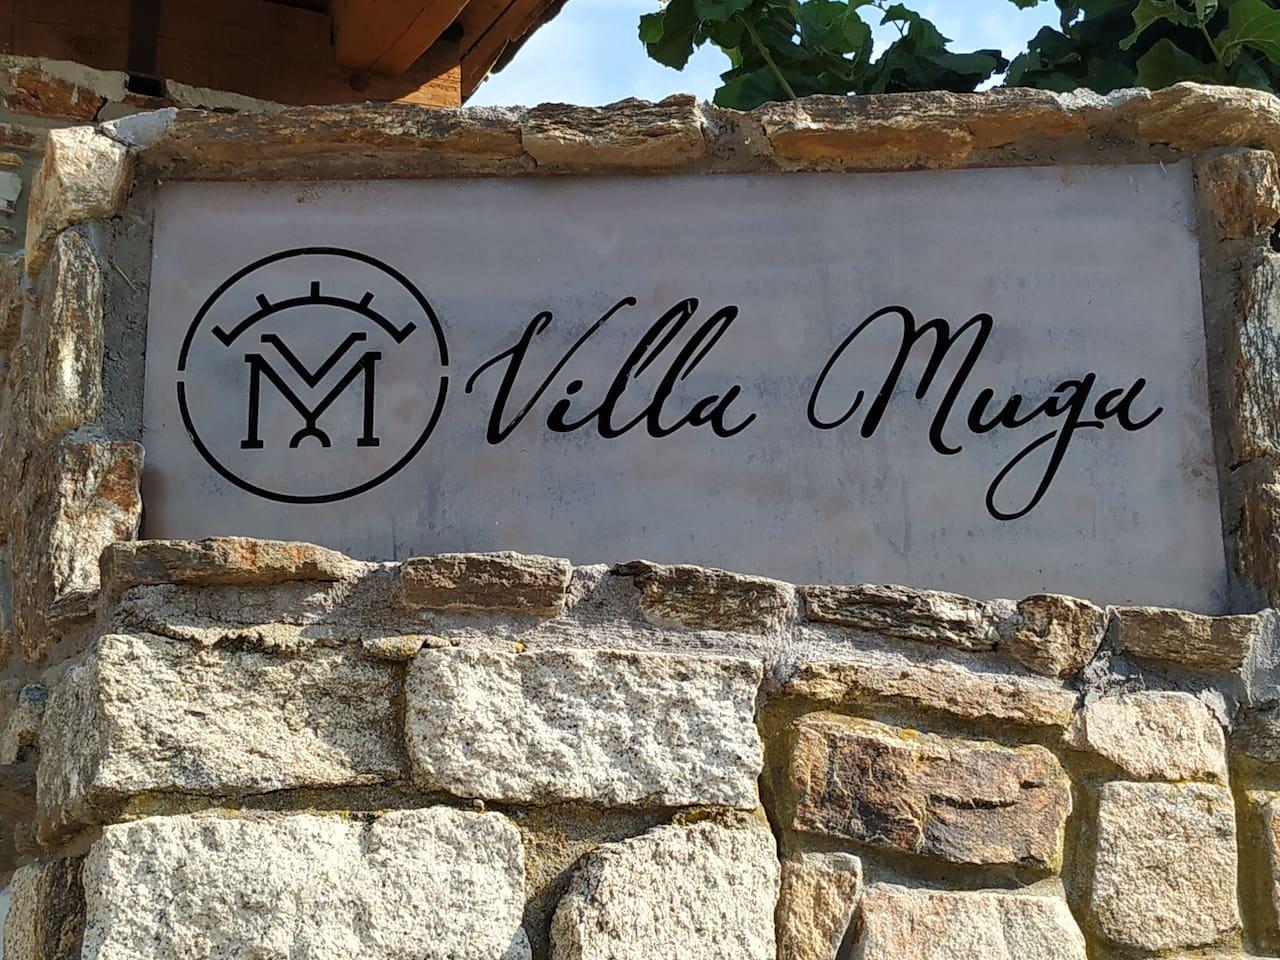 Finca Villa Muga, Gascones (Sierra de Madrid).